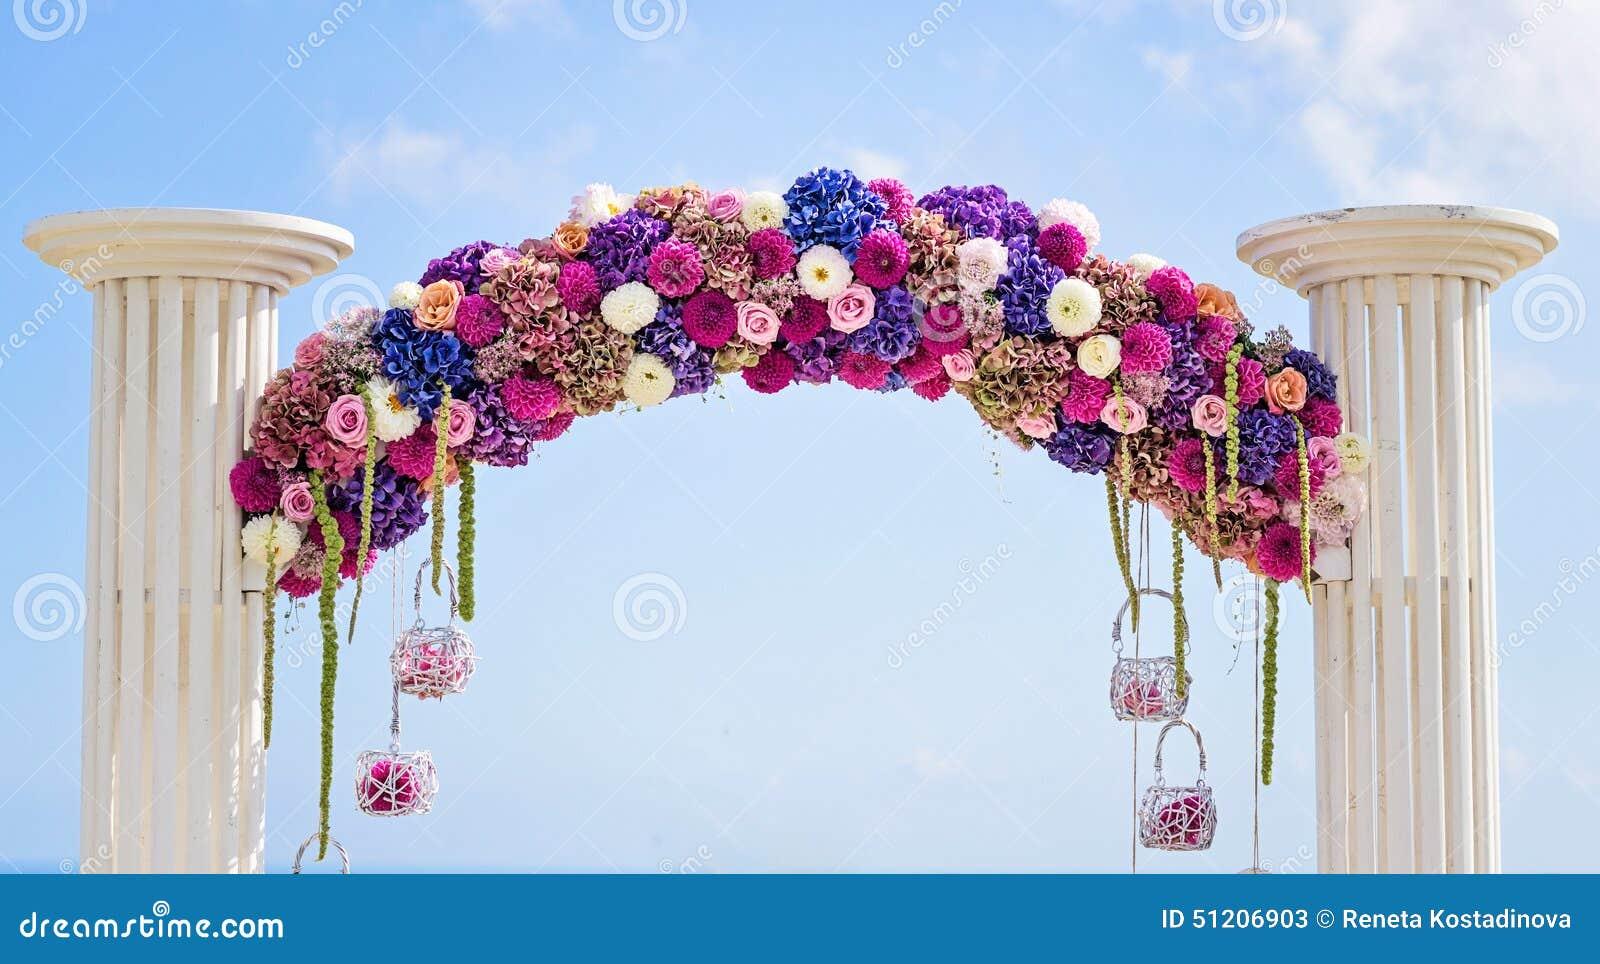 Flower Wedding Arch Stock Photo Image 51206903